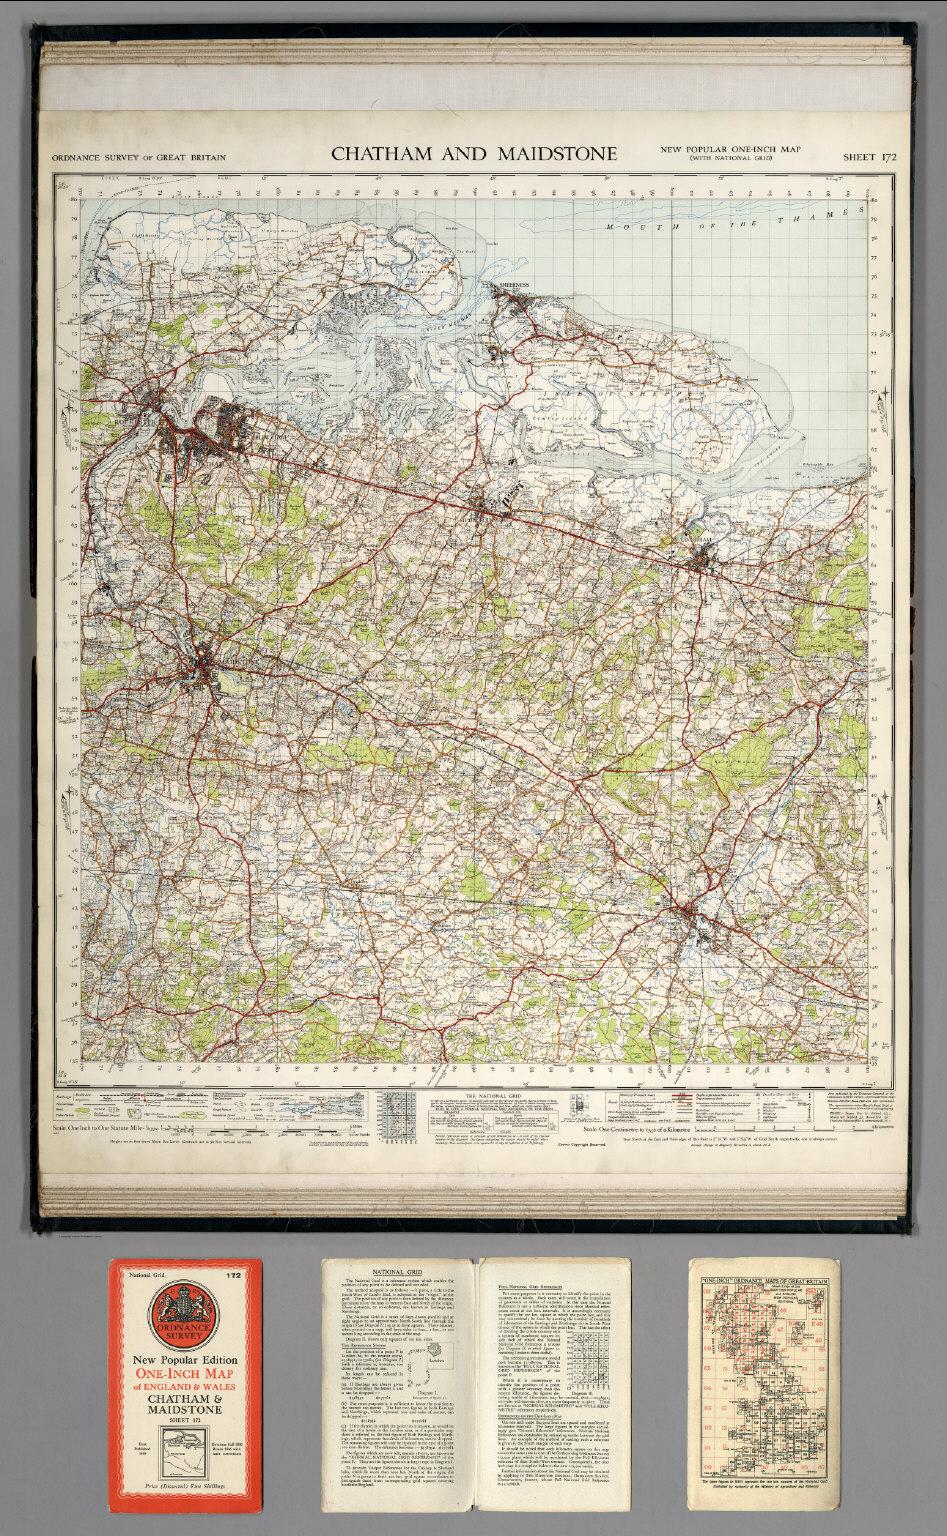 Chatham England Map.Sheet 172 Chatham And Maidstone David Rumsey Historical Map